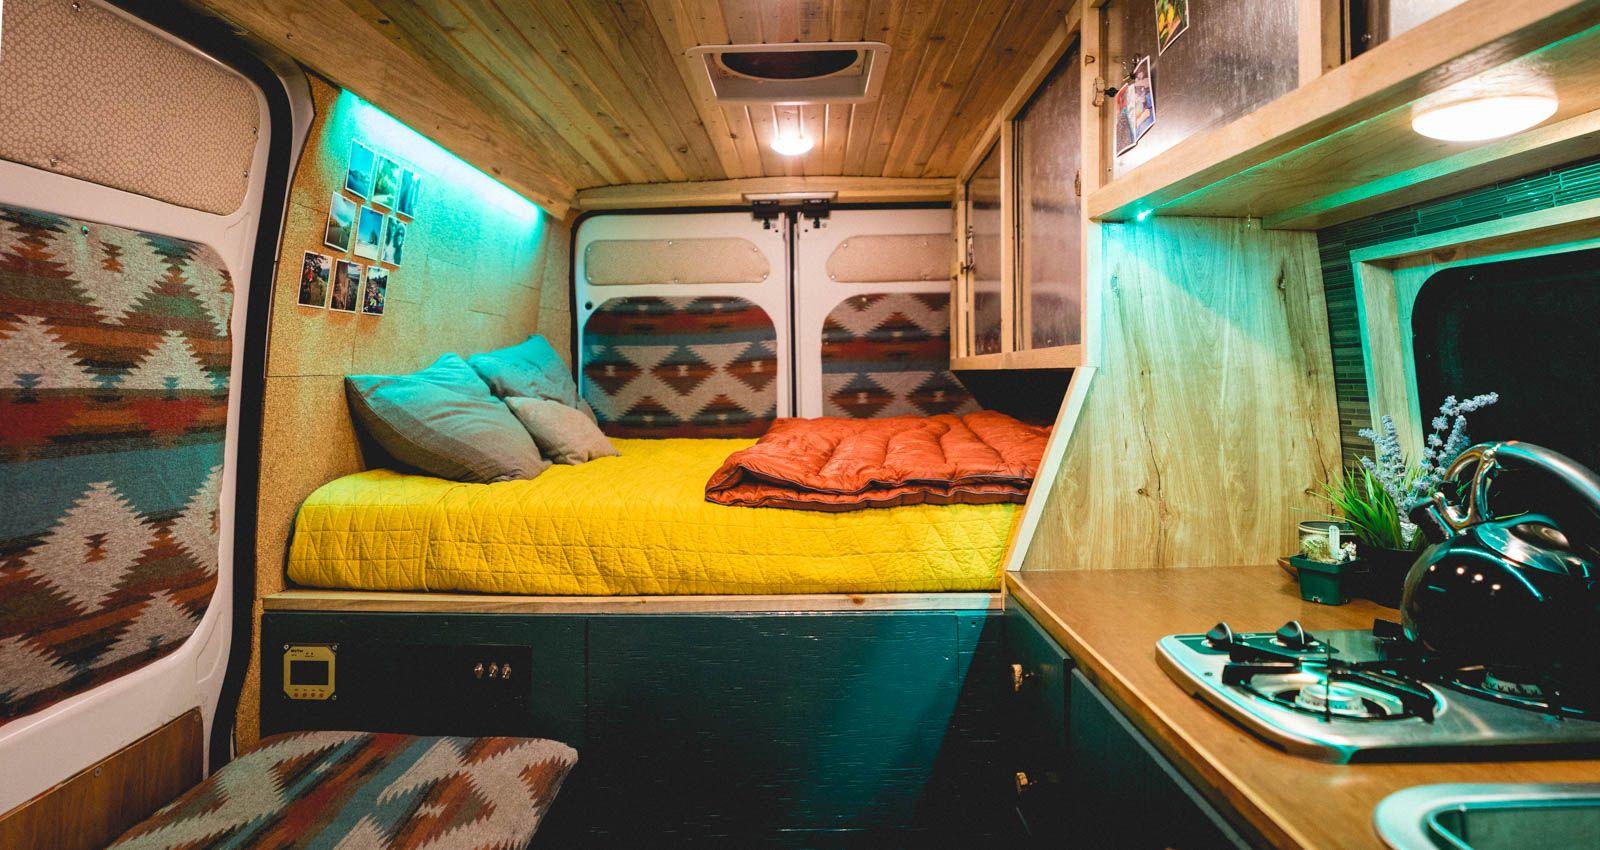 2015 Dodge Ram ProMaster Van Adventuremobile